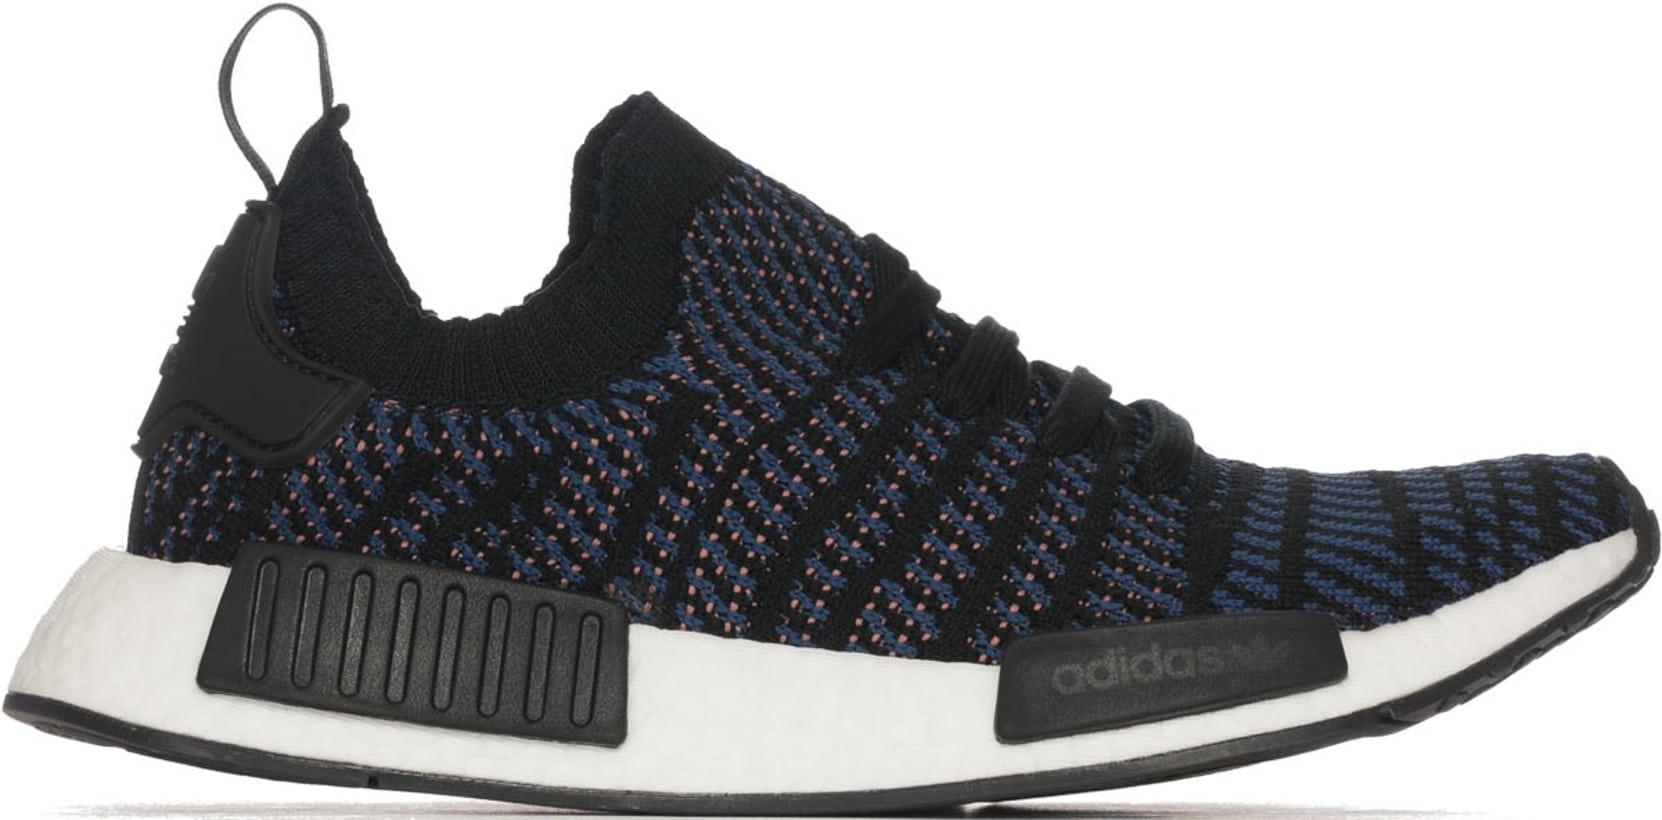 separation shoes 66dc2 7b68a adidas Originals. NMD R1 STLT Primeknit - Core BlackAsh PinkNoble Indigo